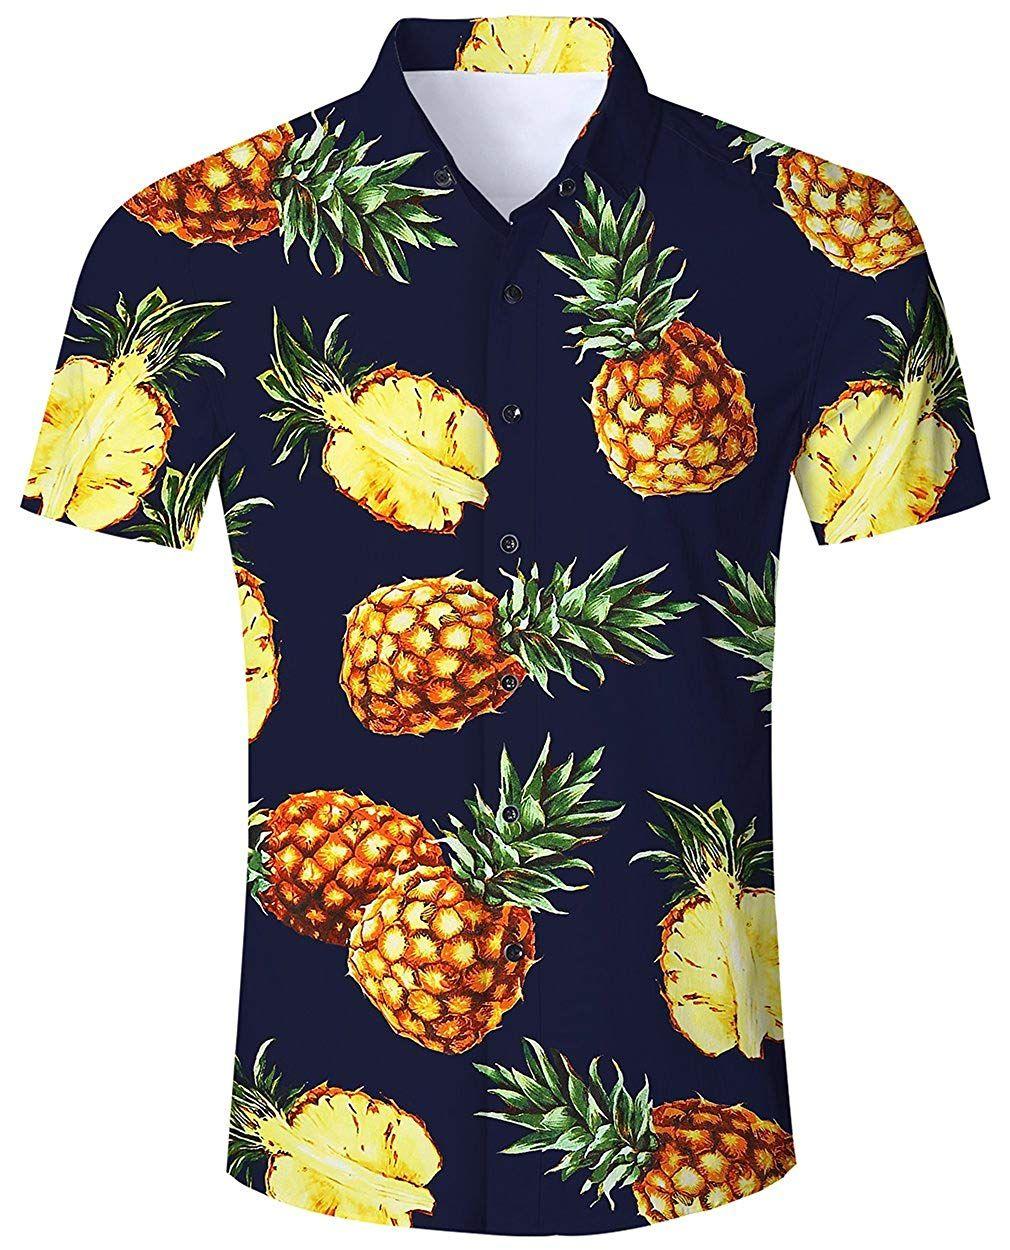 Camisa Hawaiana Para Hombre Mujer Casual Manga Corta Camisas Playa Verano Unisex 3d Estampada Funny Hawaii Pina Negra Disfraceslandia Camisa Hawaiana Ropa Informal Masculina Camisas